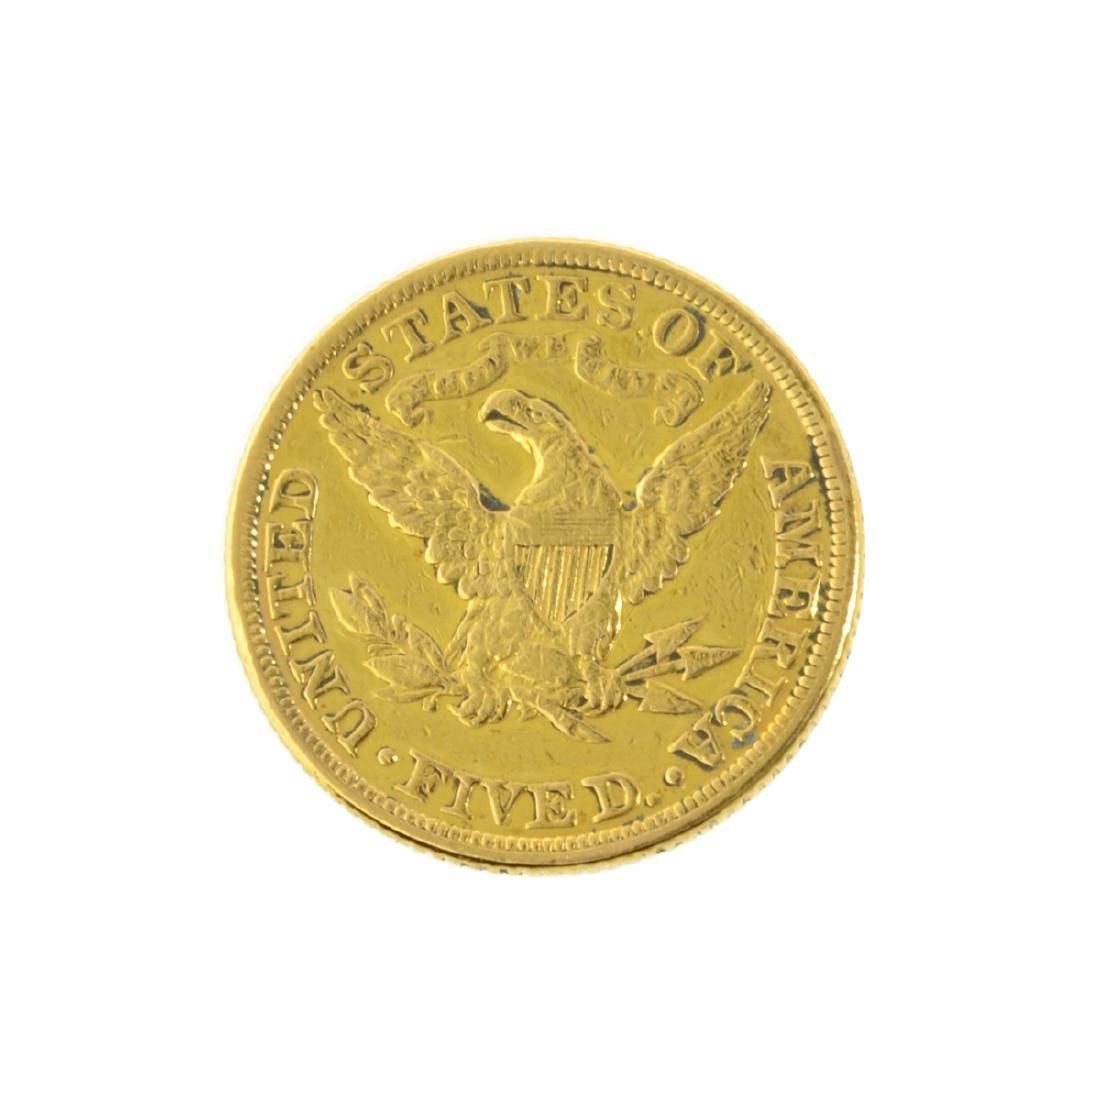 *1881 $5 U.S. Liberty Head Gold Coin (JG-MRT) - 2